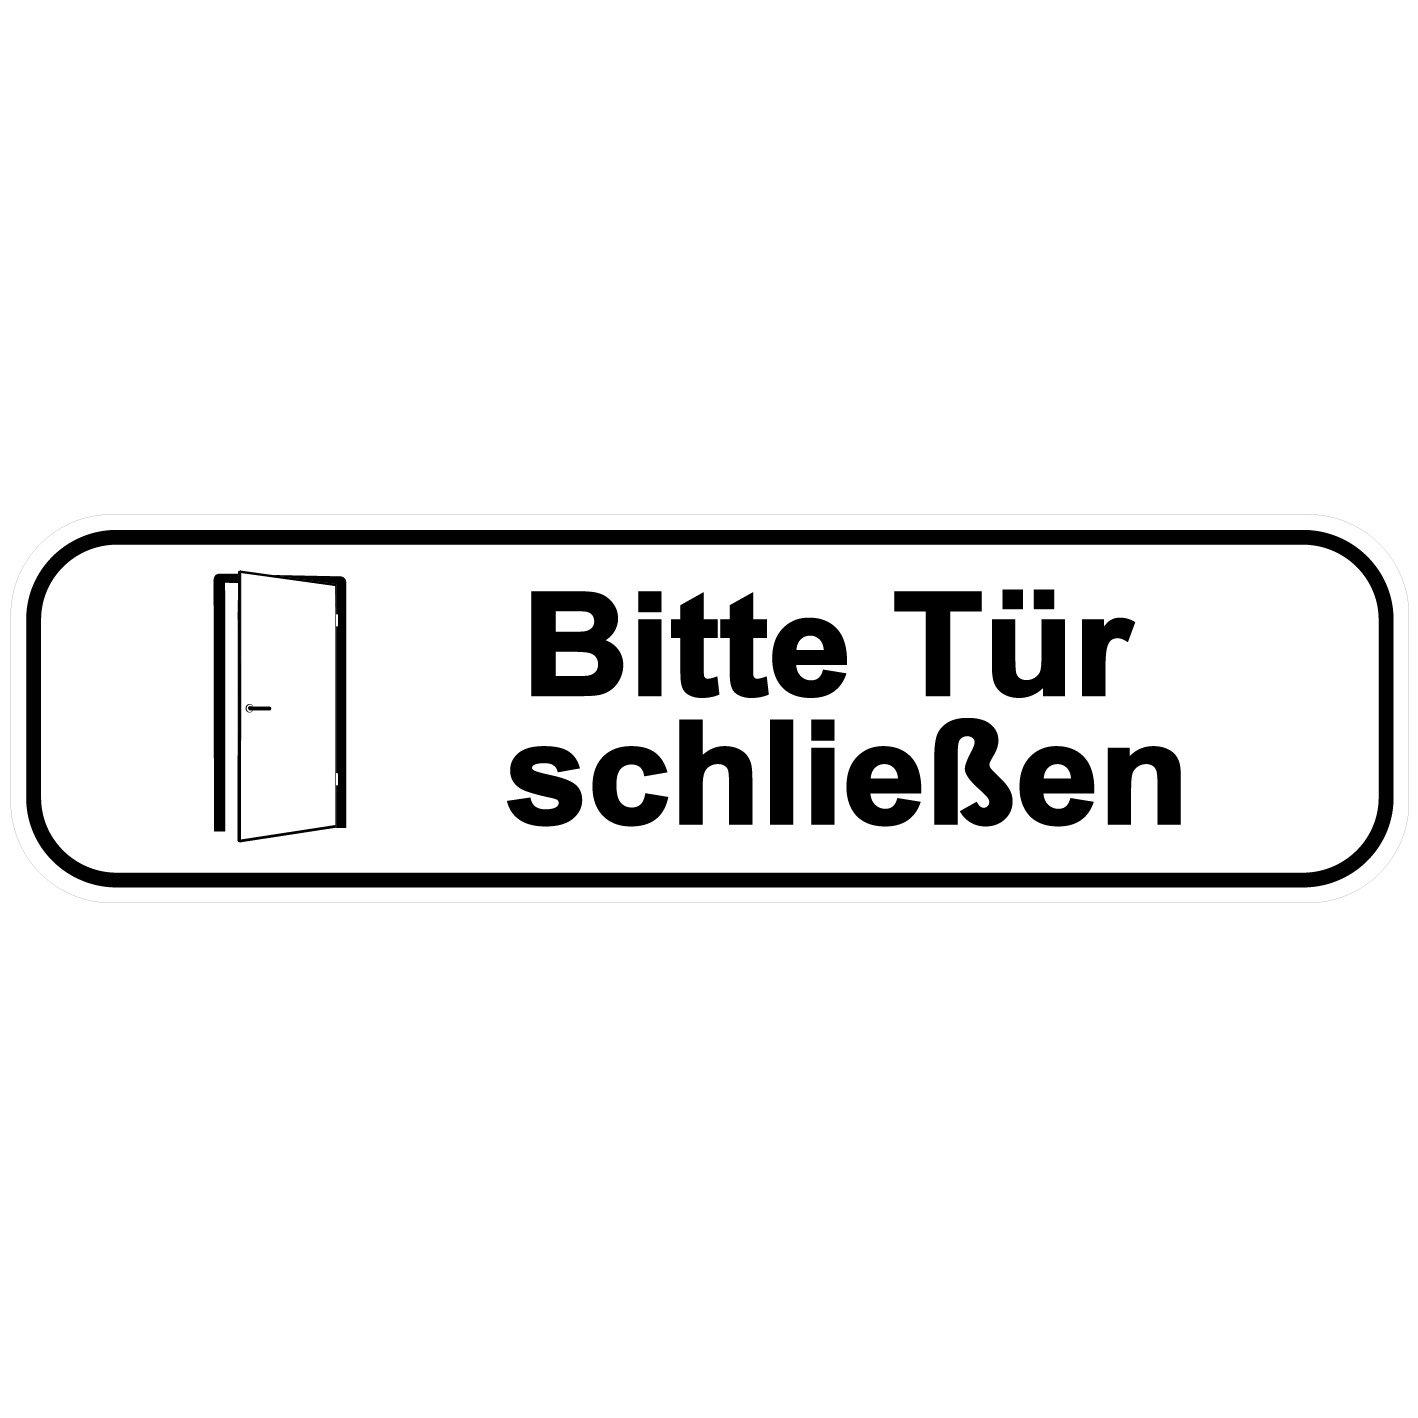 'Bitte Tü r schließ en' Aufkleber / Tü raufkleber/ Tü rschild/ PVC Hinweisschild 180mm x 50mm Weiß /Schwarz selbstklebend Kinekt3d Leitsysteme